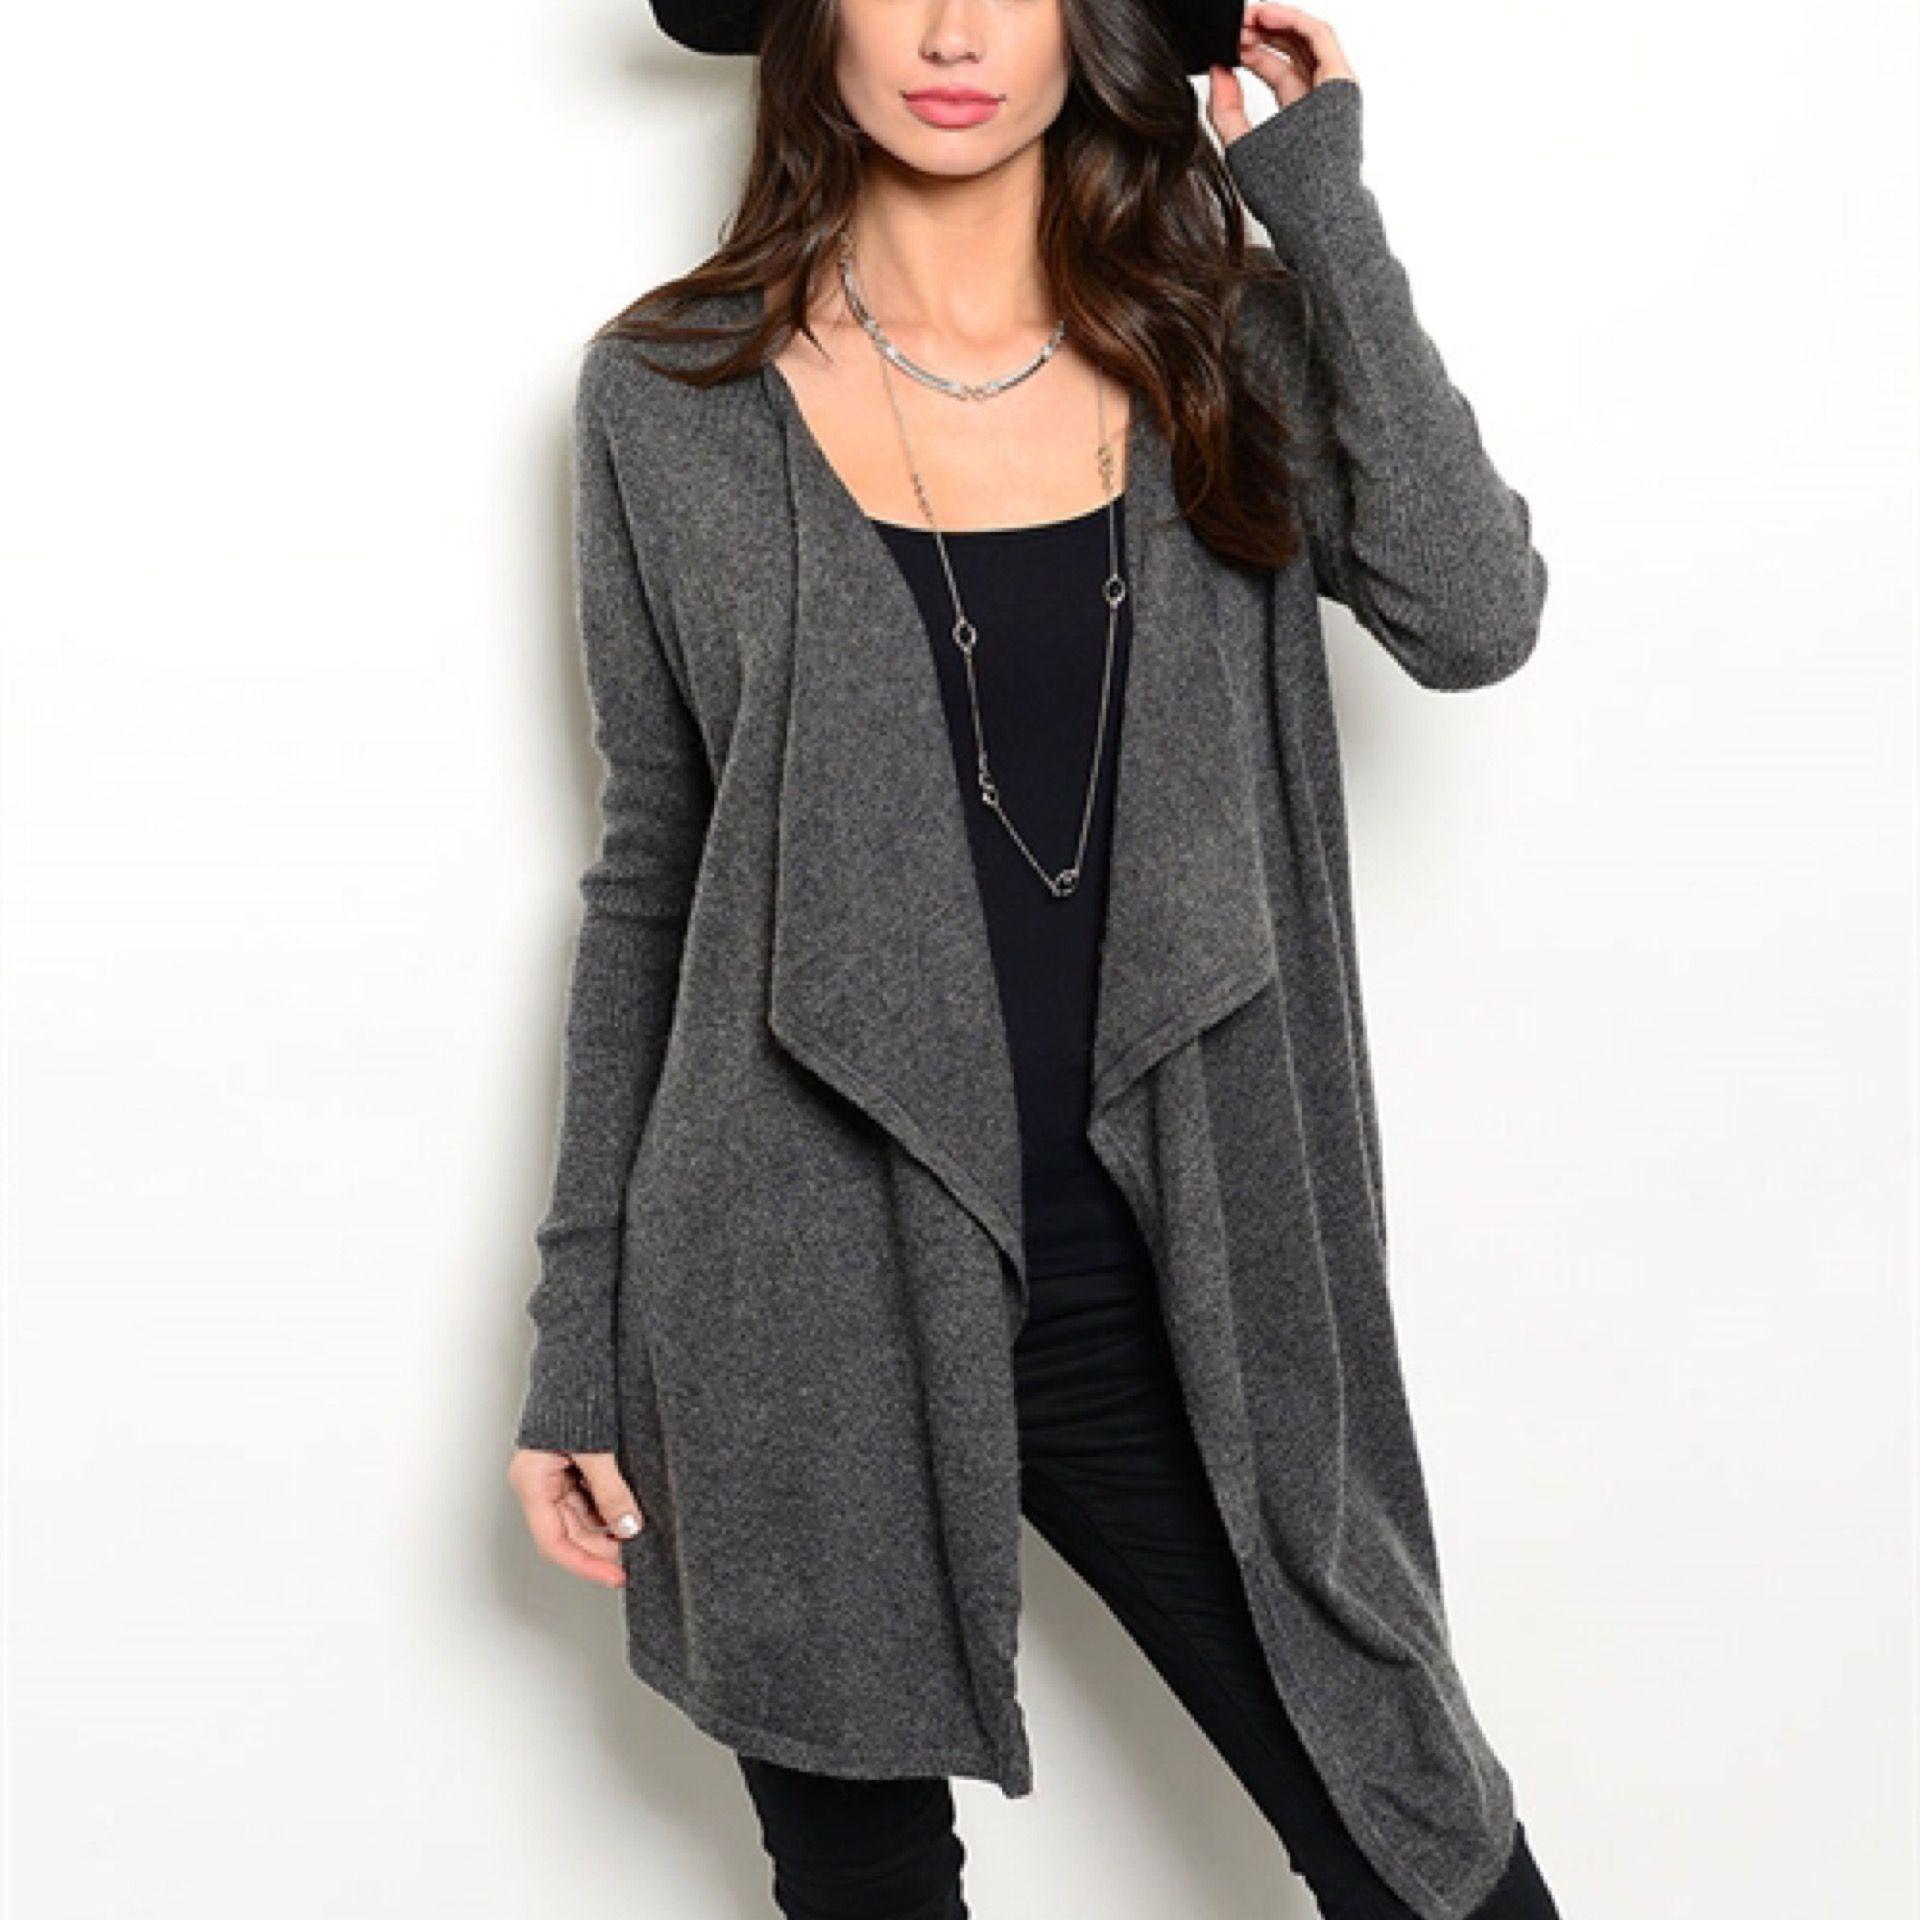 Gracie Gray Sweater / Cardigan | Fashionable Cardigan/Kimono ...